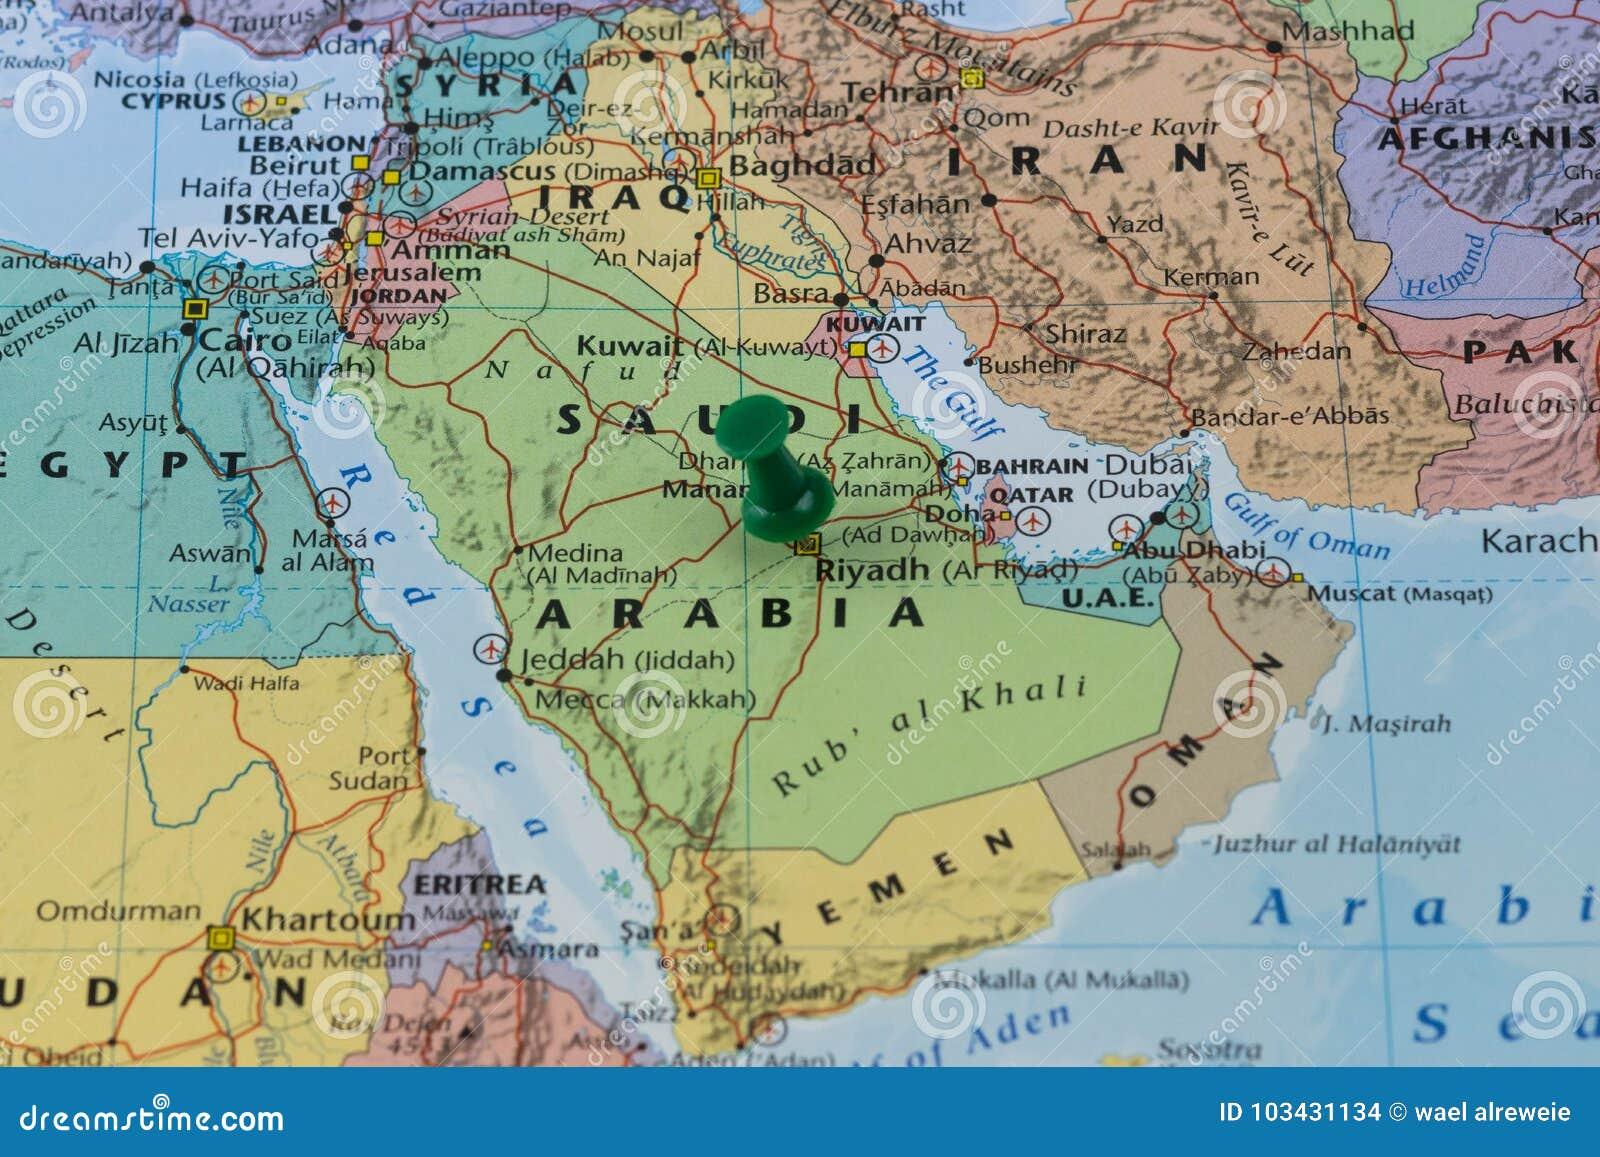 Riyadh Pinned On A Map Of Saudi Arabia With A Green Pin ... on middle east map, riyadh on a map, world landforms map, jerusalem map, riyadh street map, damascus map,